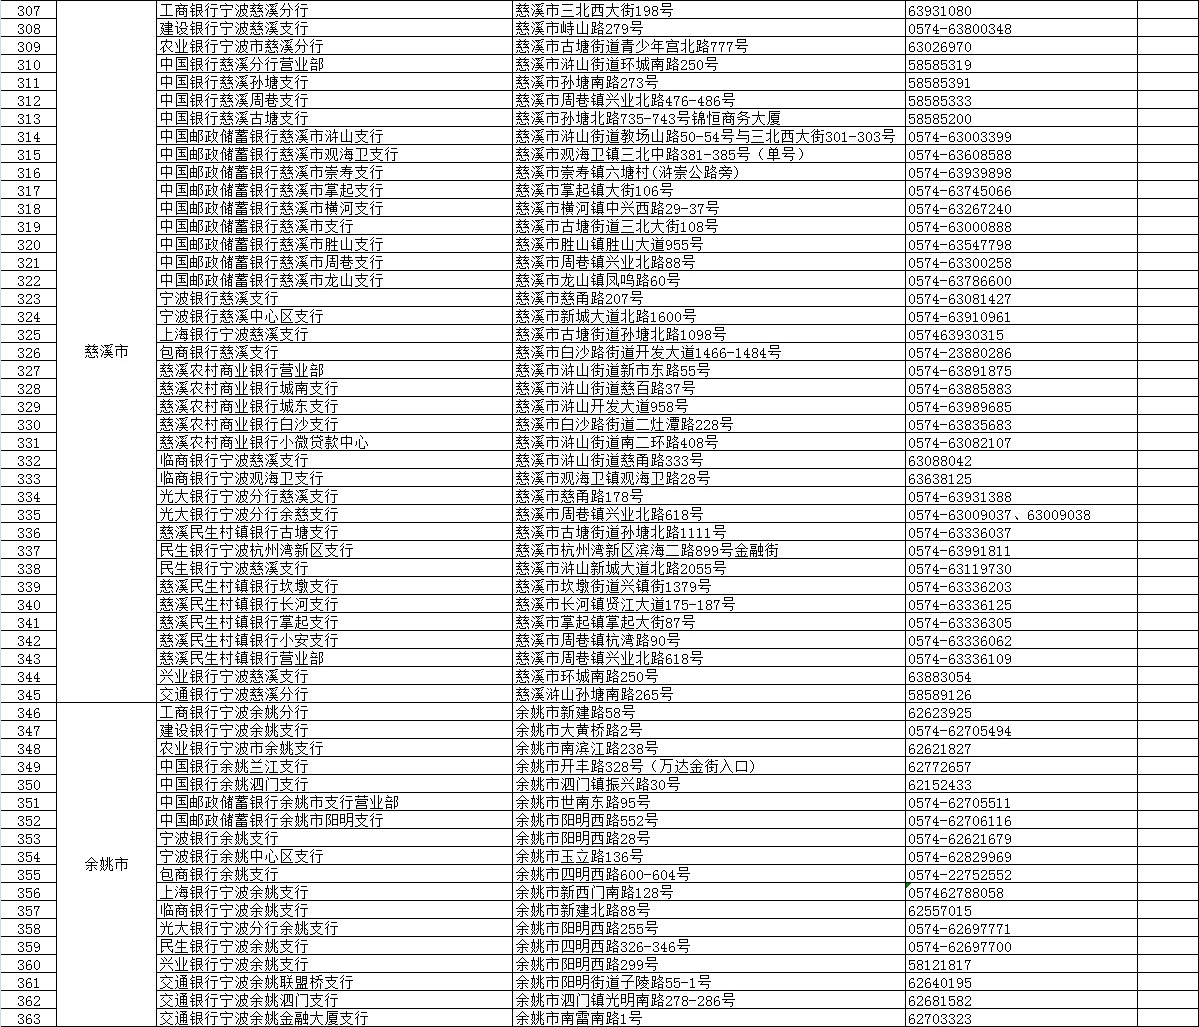 C:\Users\Administrator\Desktop\银行资金监管服务点12-6更新图片-4.jpg